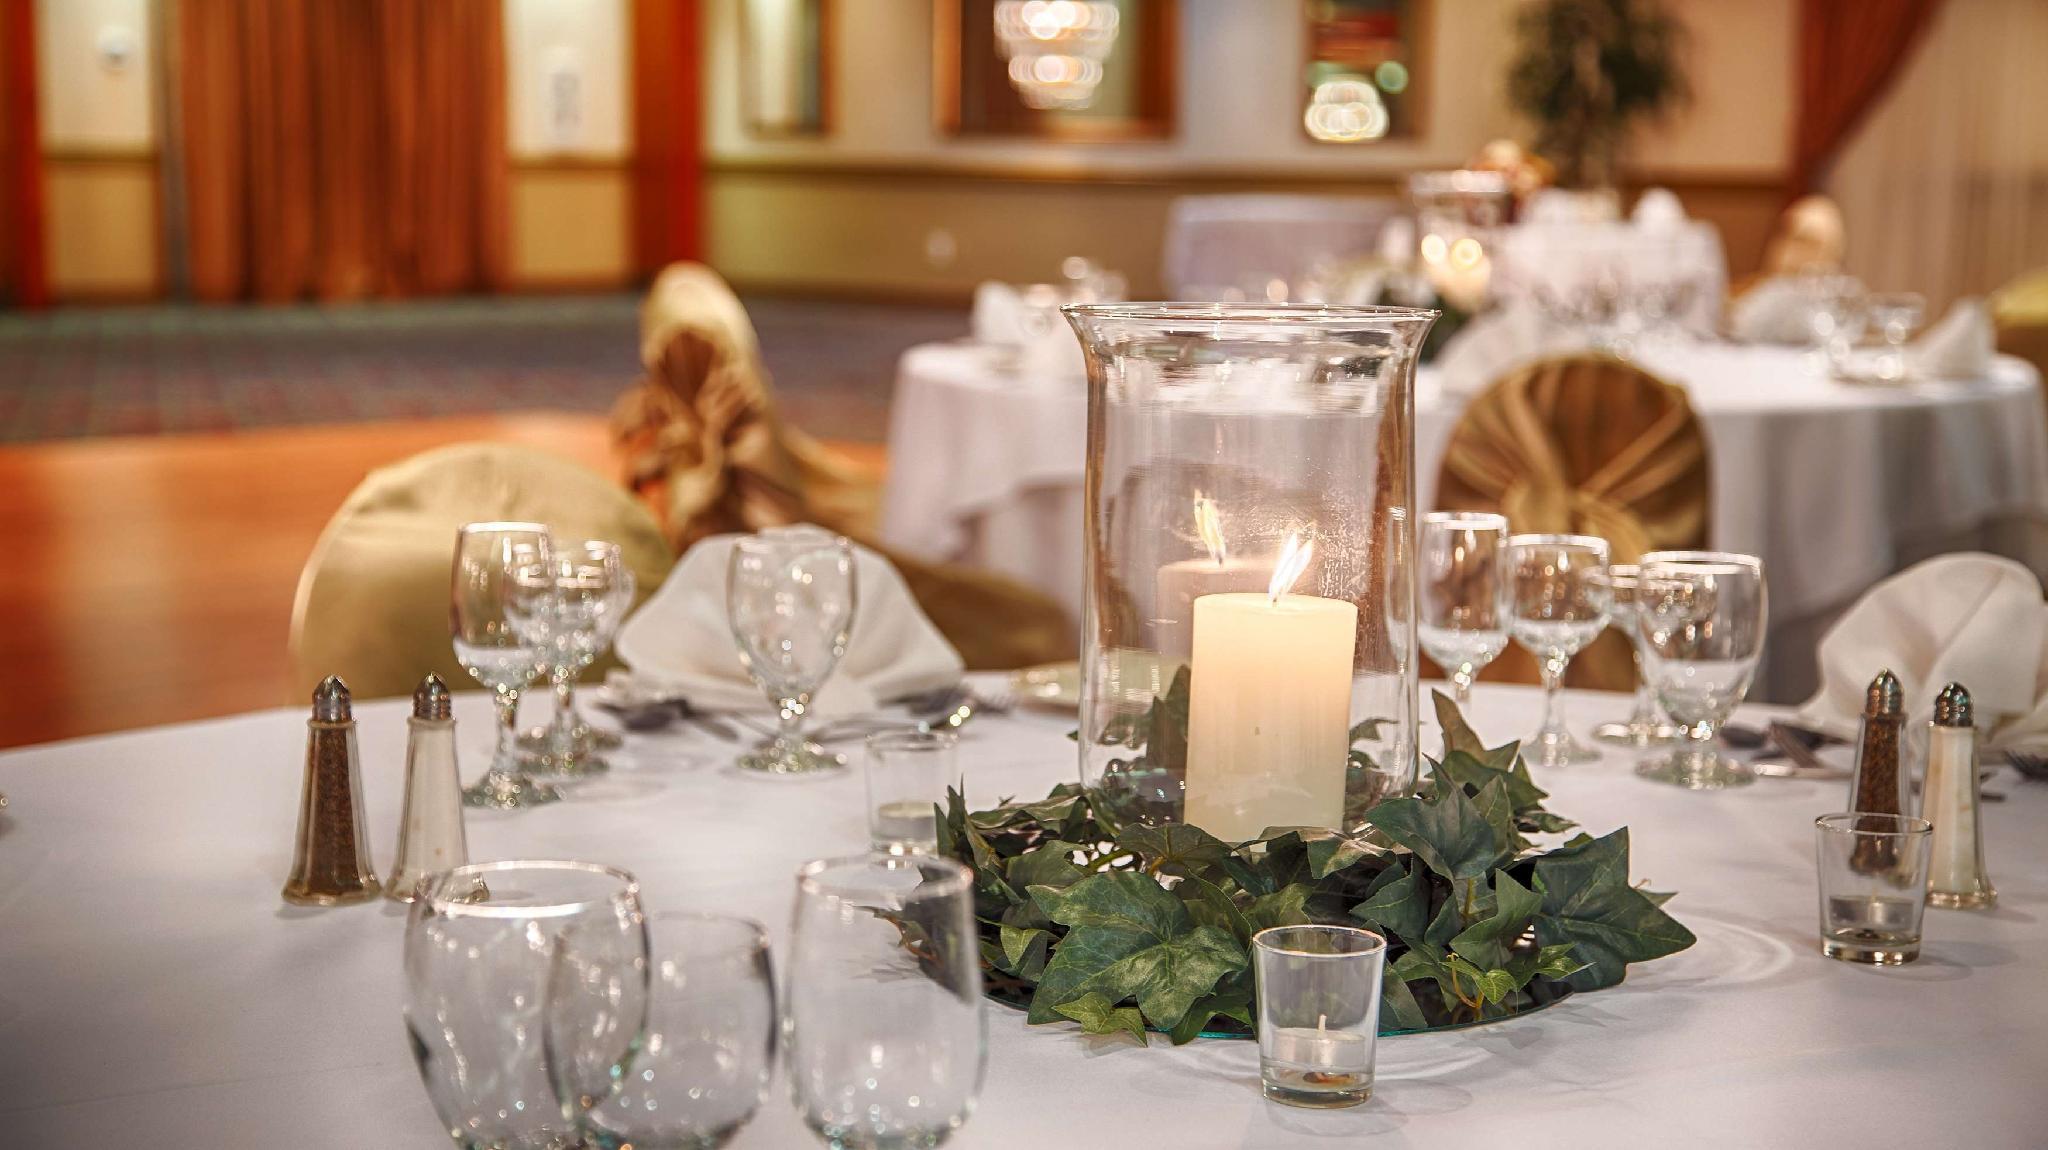 Review Best Western Inn at Hunts Landing